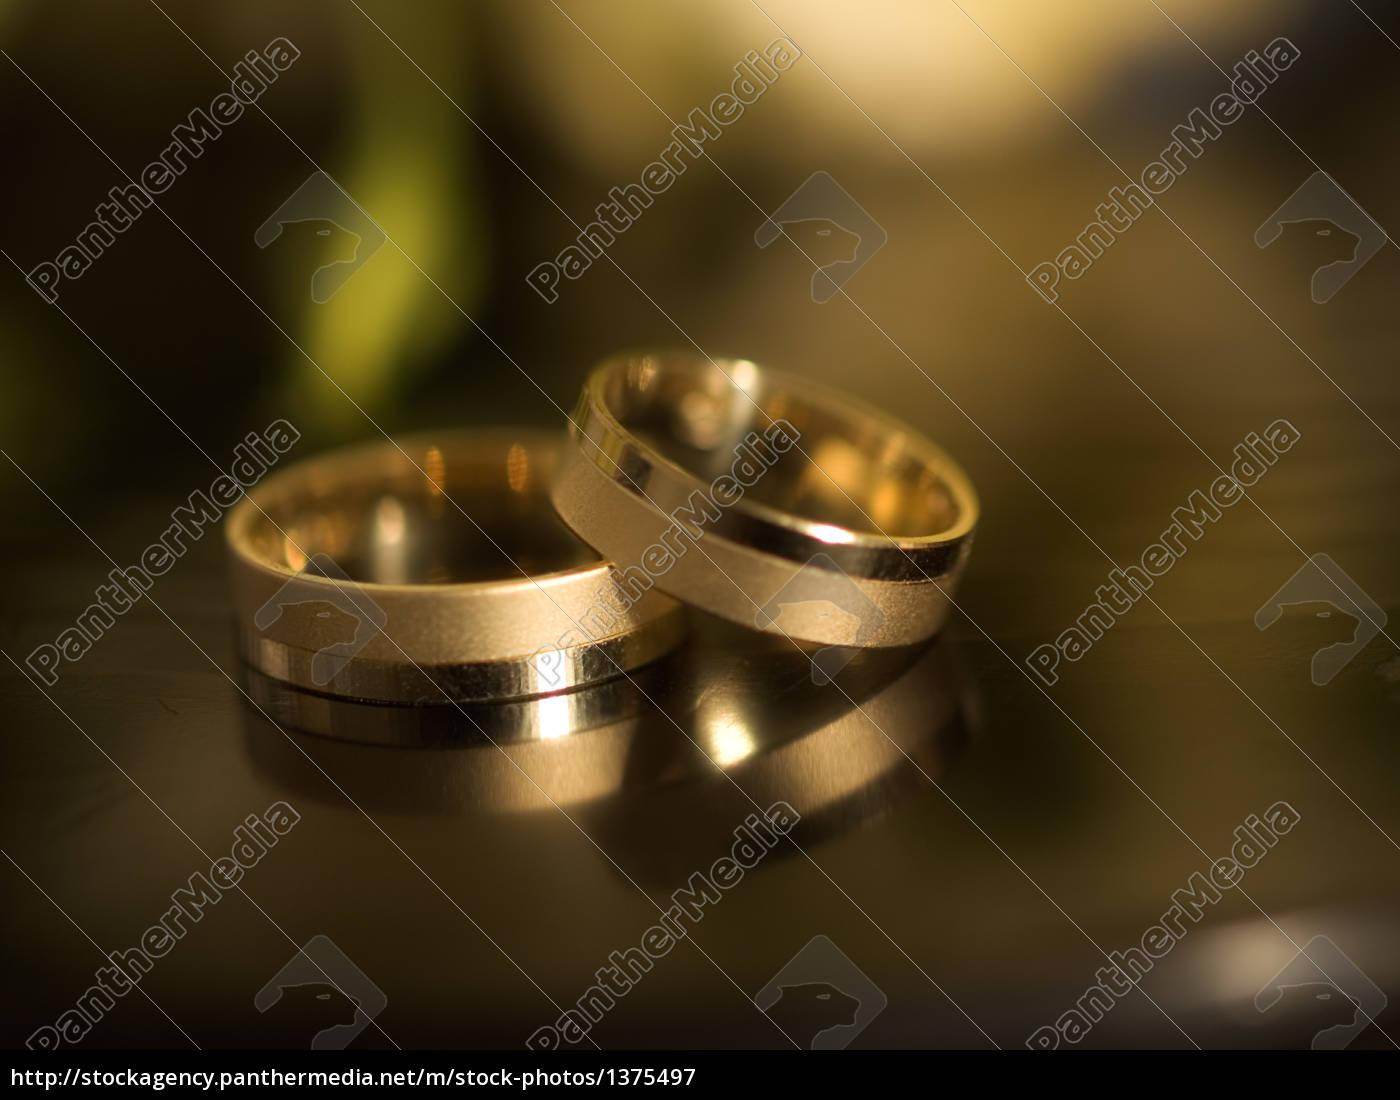 wedding, rings - 1375497